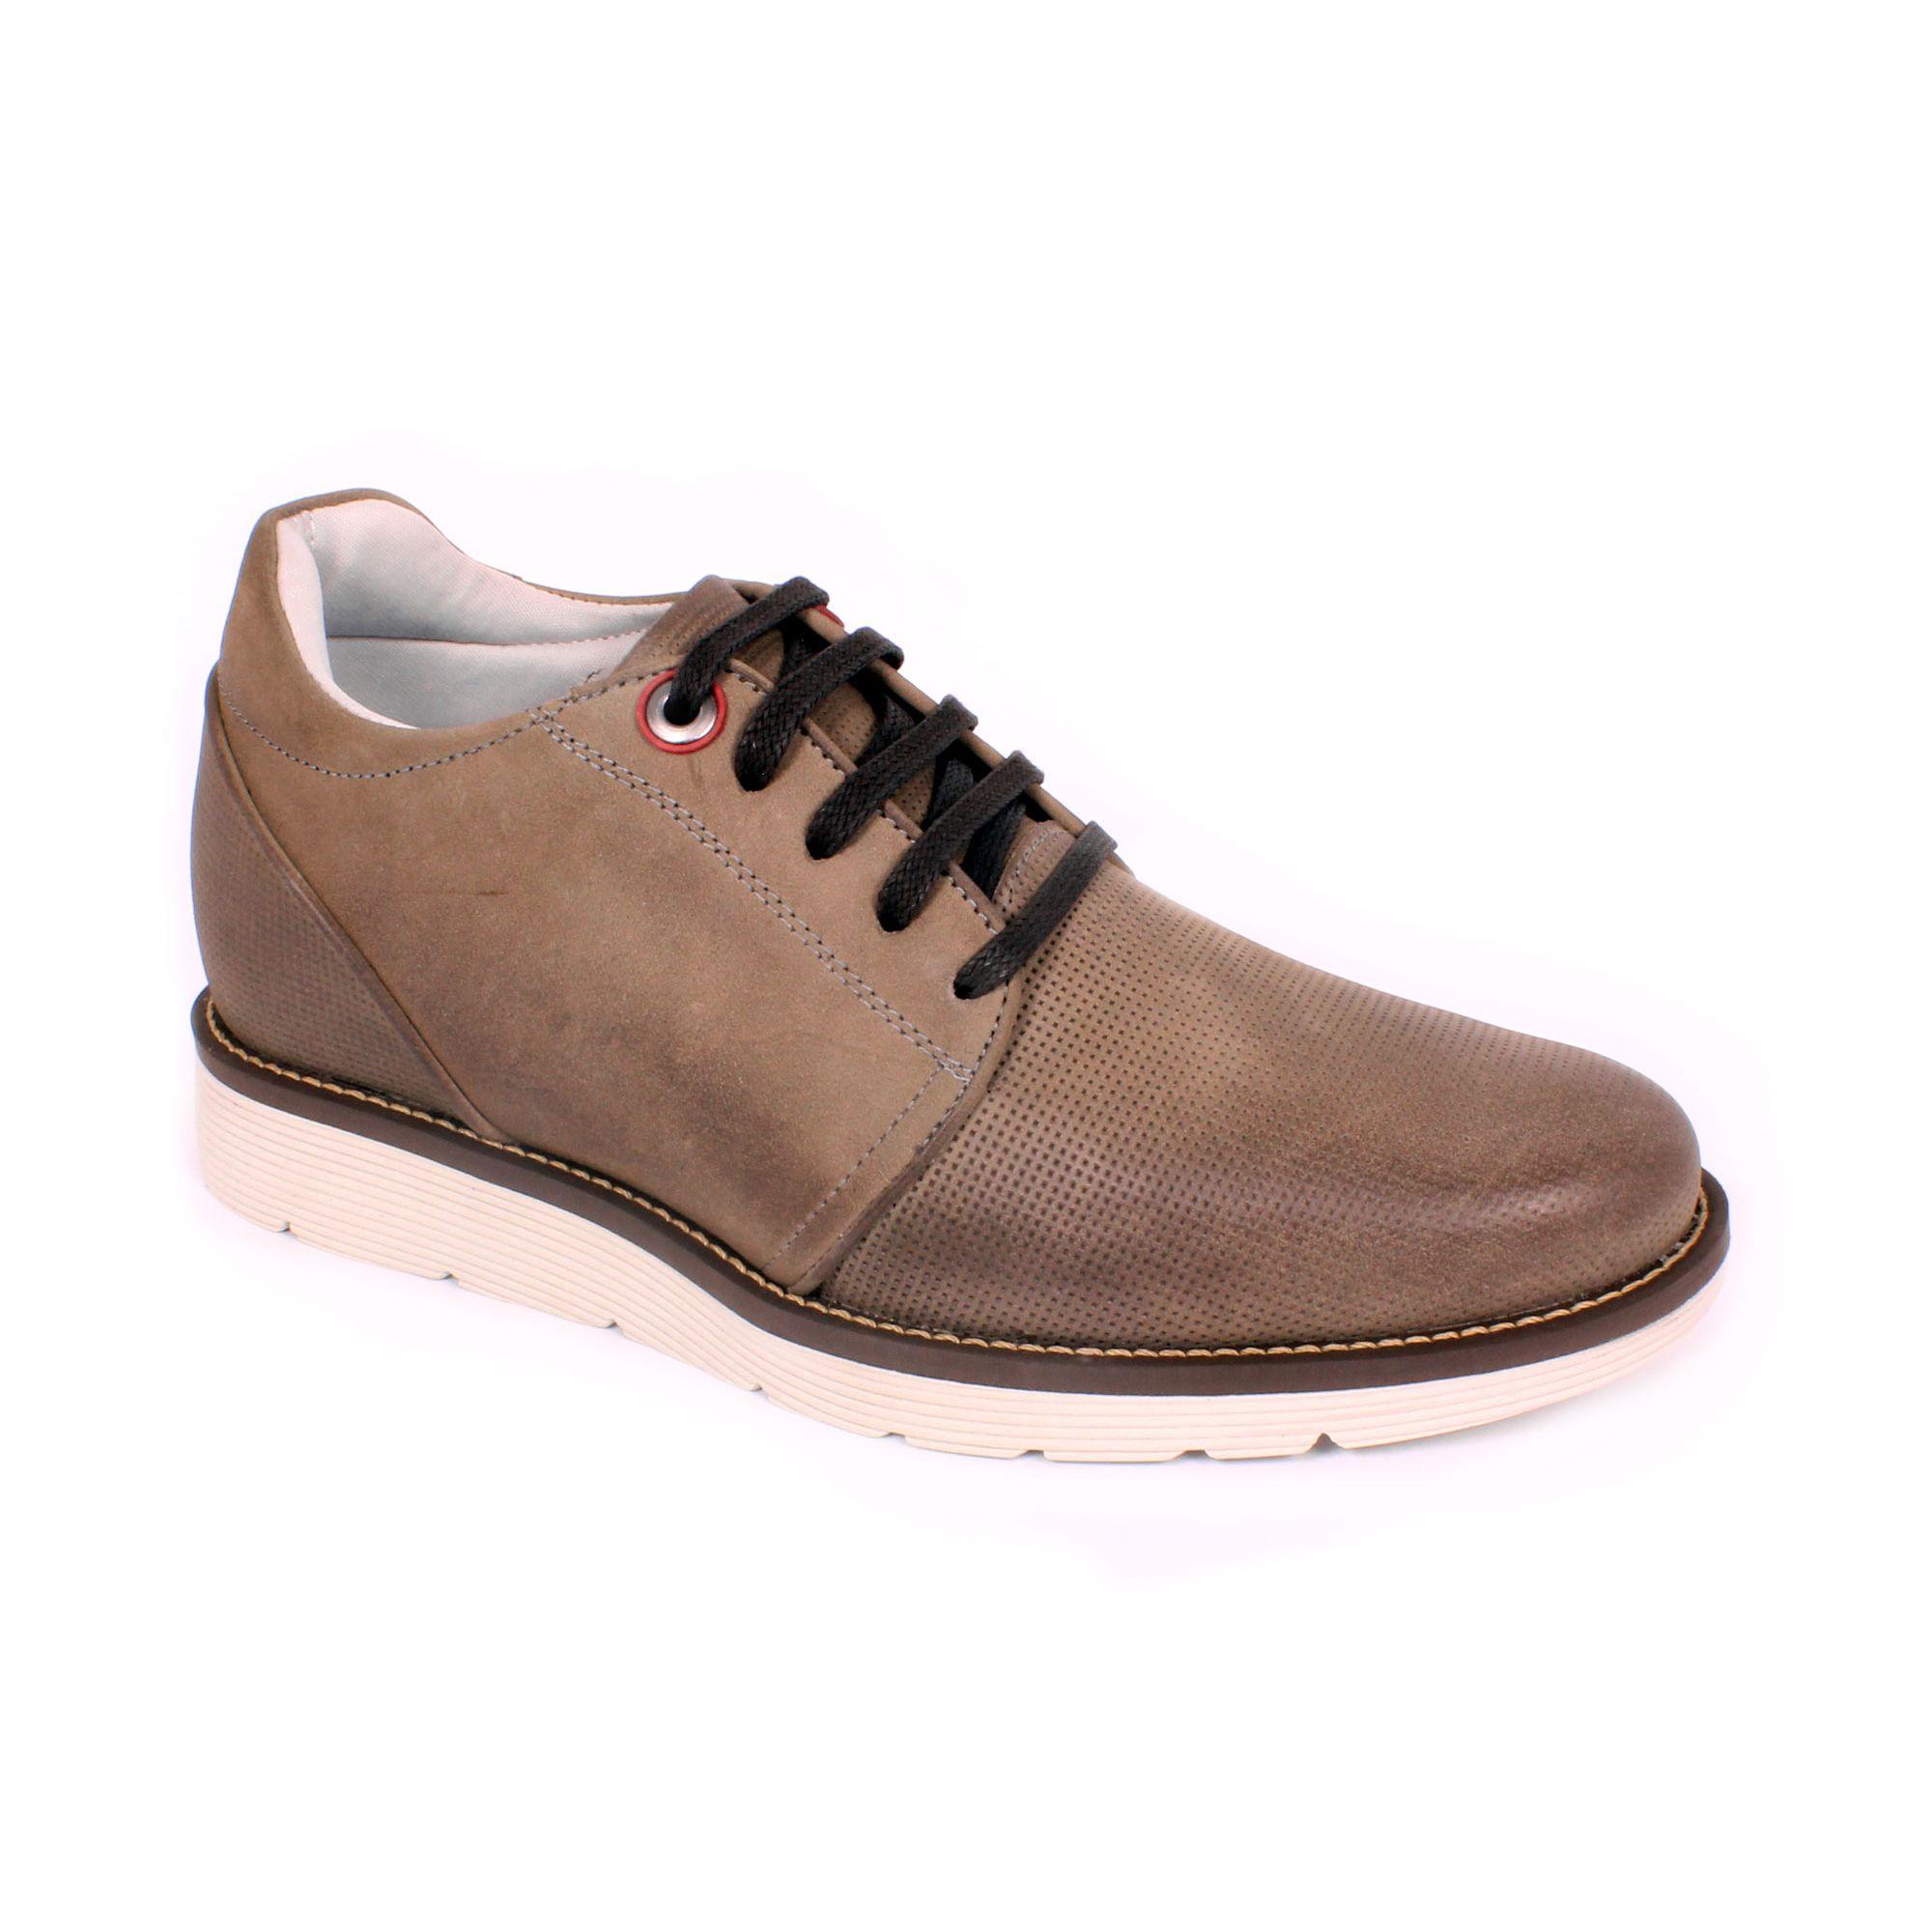 Zapato Casual Avenue Gris Max Denegri +7cms de Altura_70860